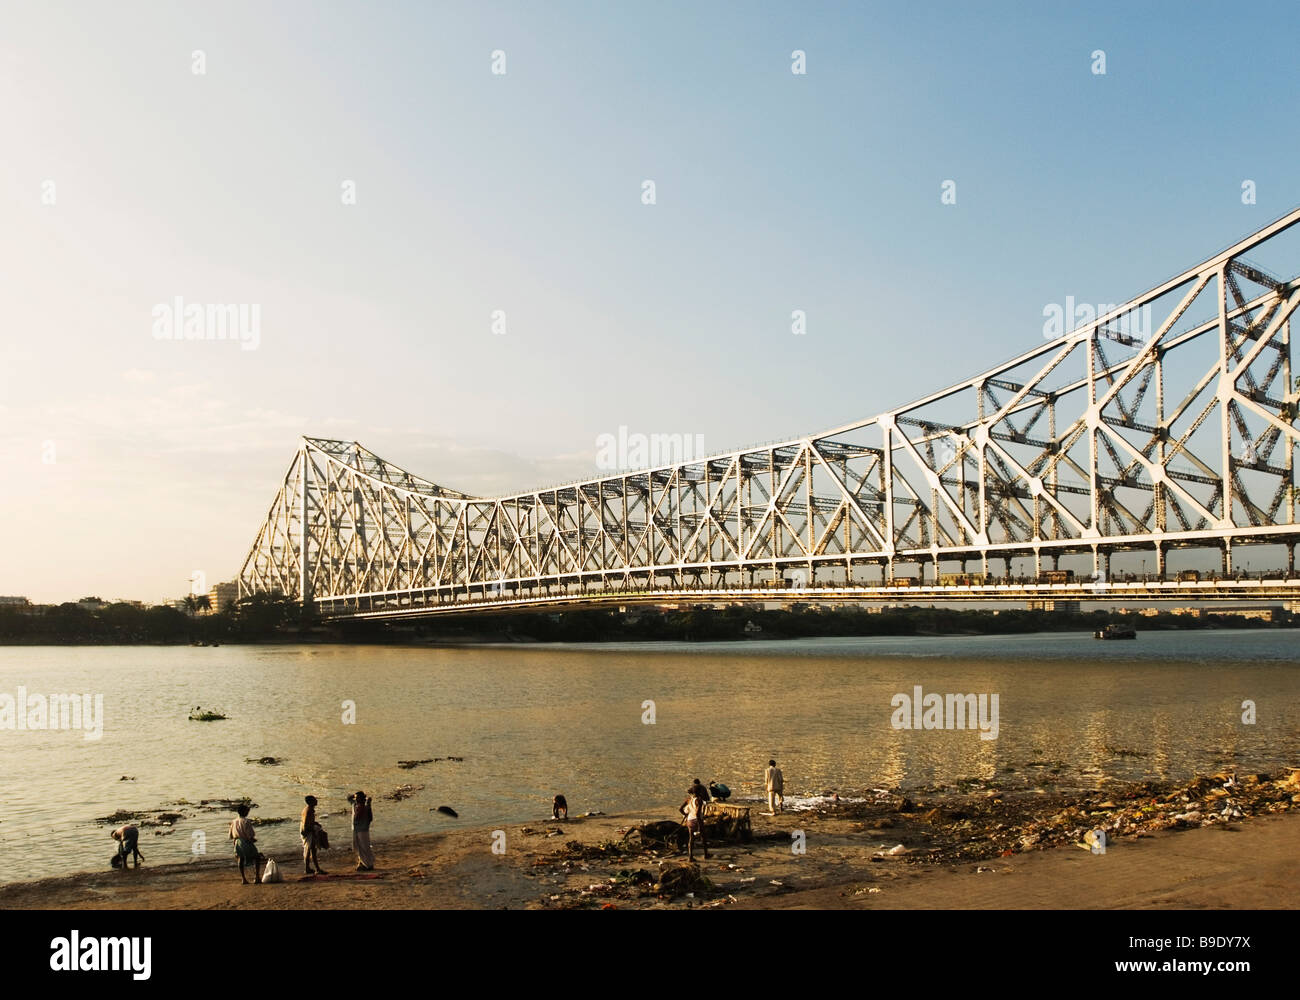 Bridge across a river howrah bridge hooghly river calcutta west bengal